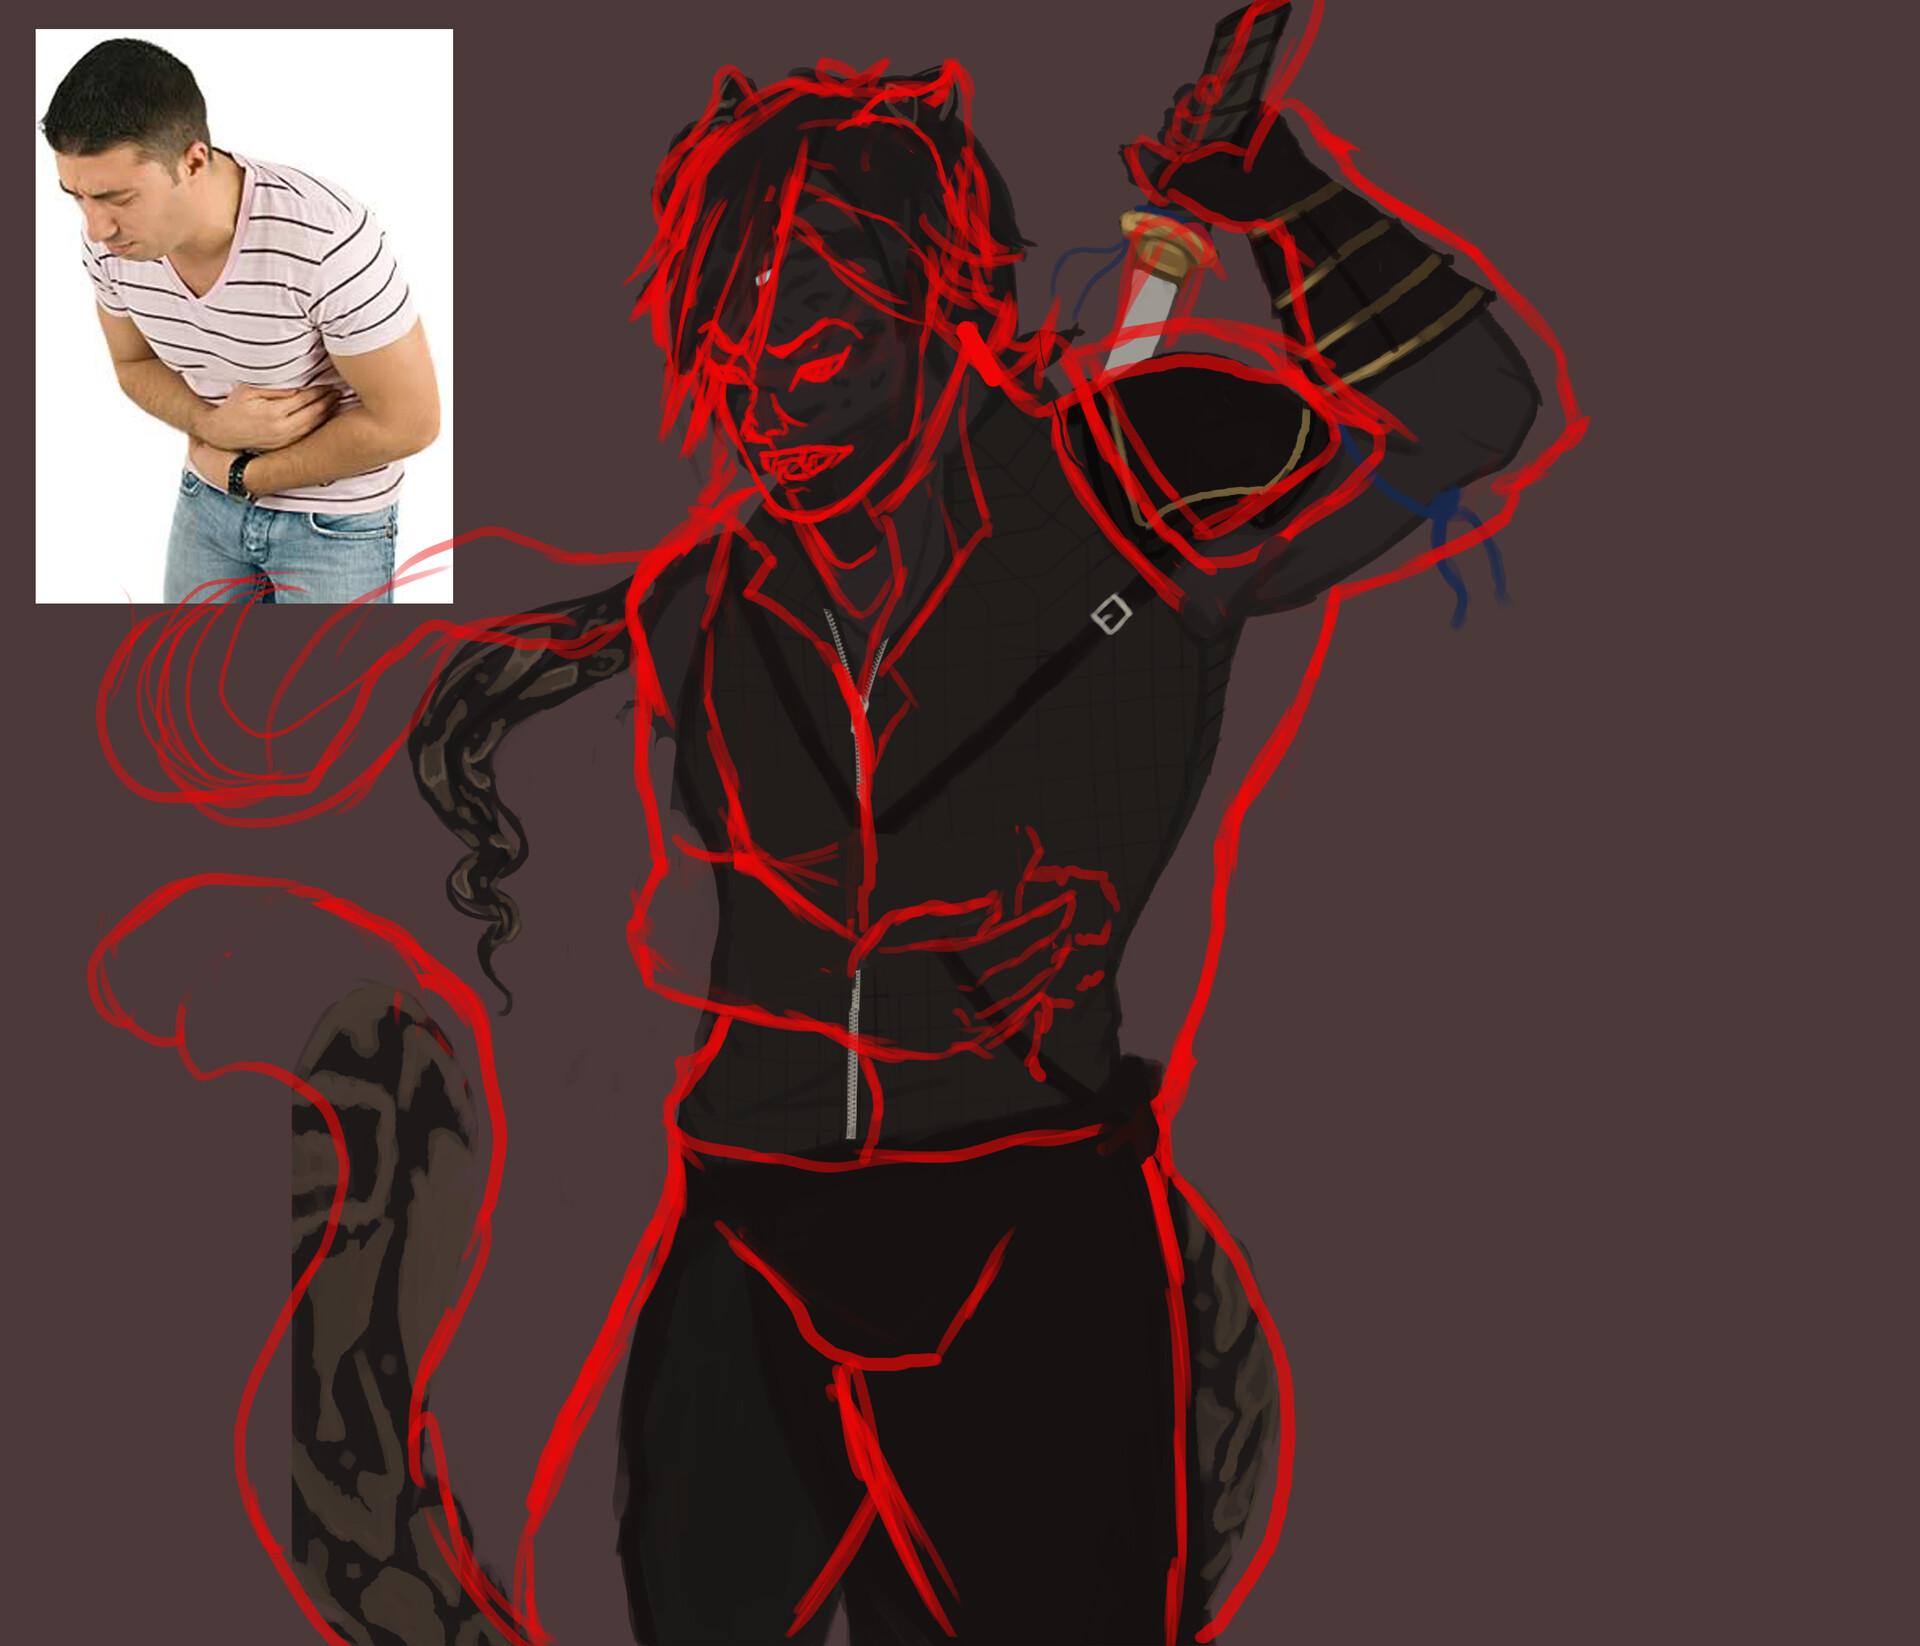 ArtStation - Character Illustration steps/progress, Rachel